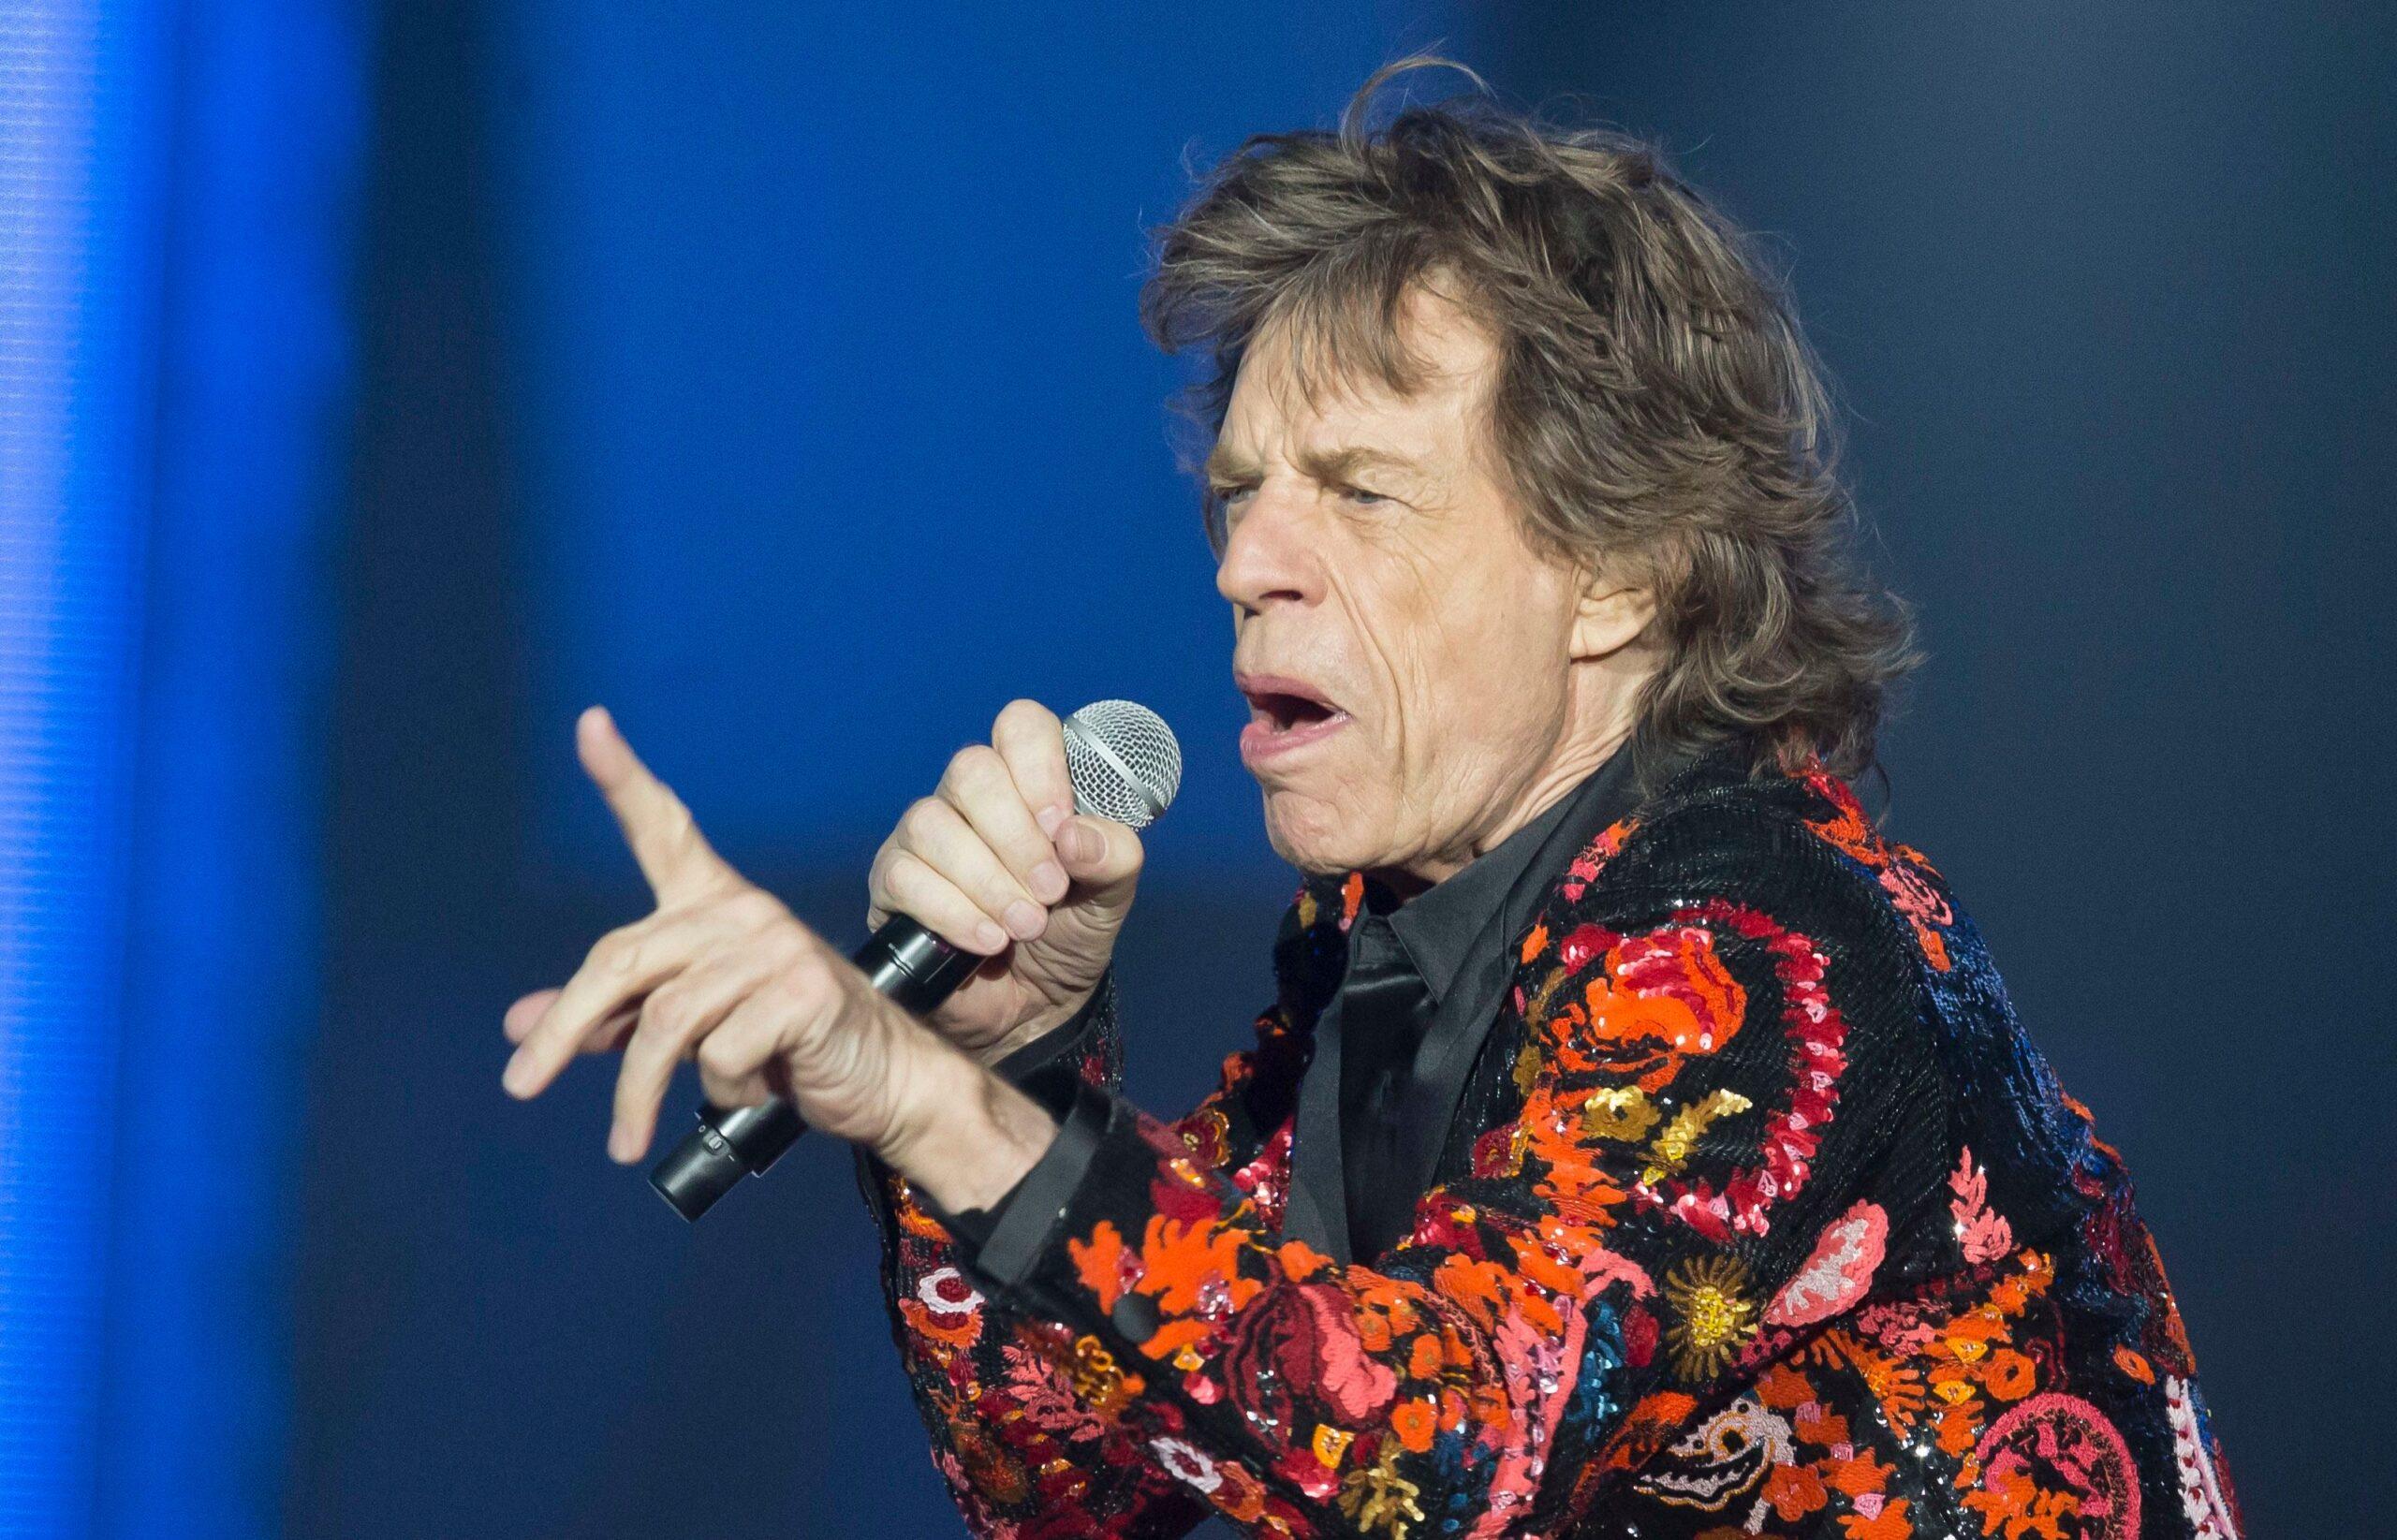 Mick Jagger (Rolling Stones)